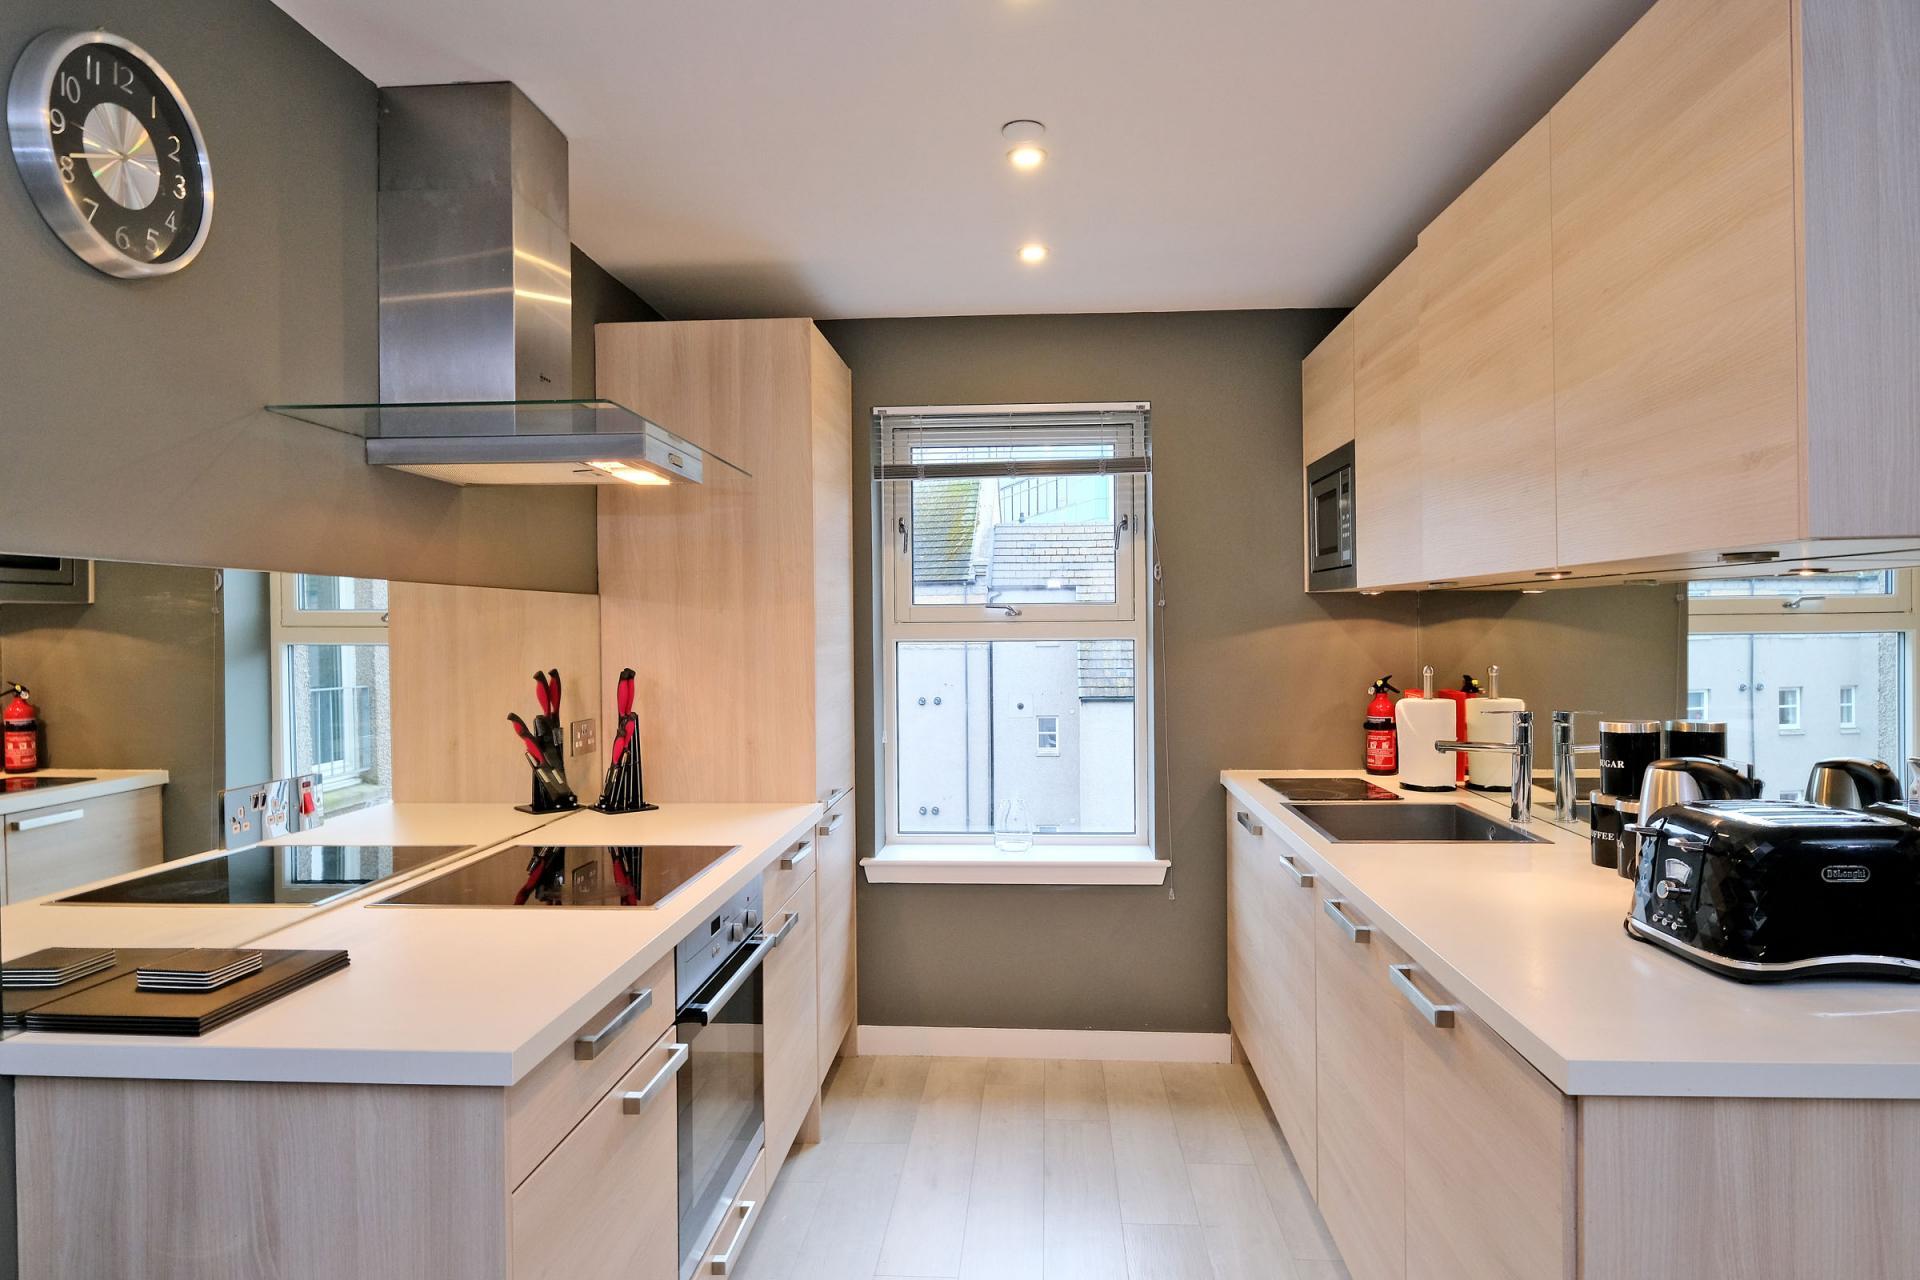 Kitchen at 54 Chapel Street Apartments, Centre, Aberdeen - Citybase Apartments